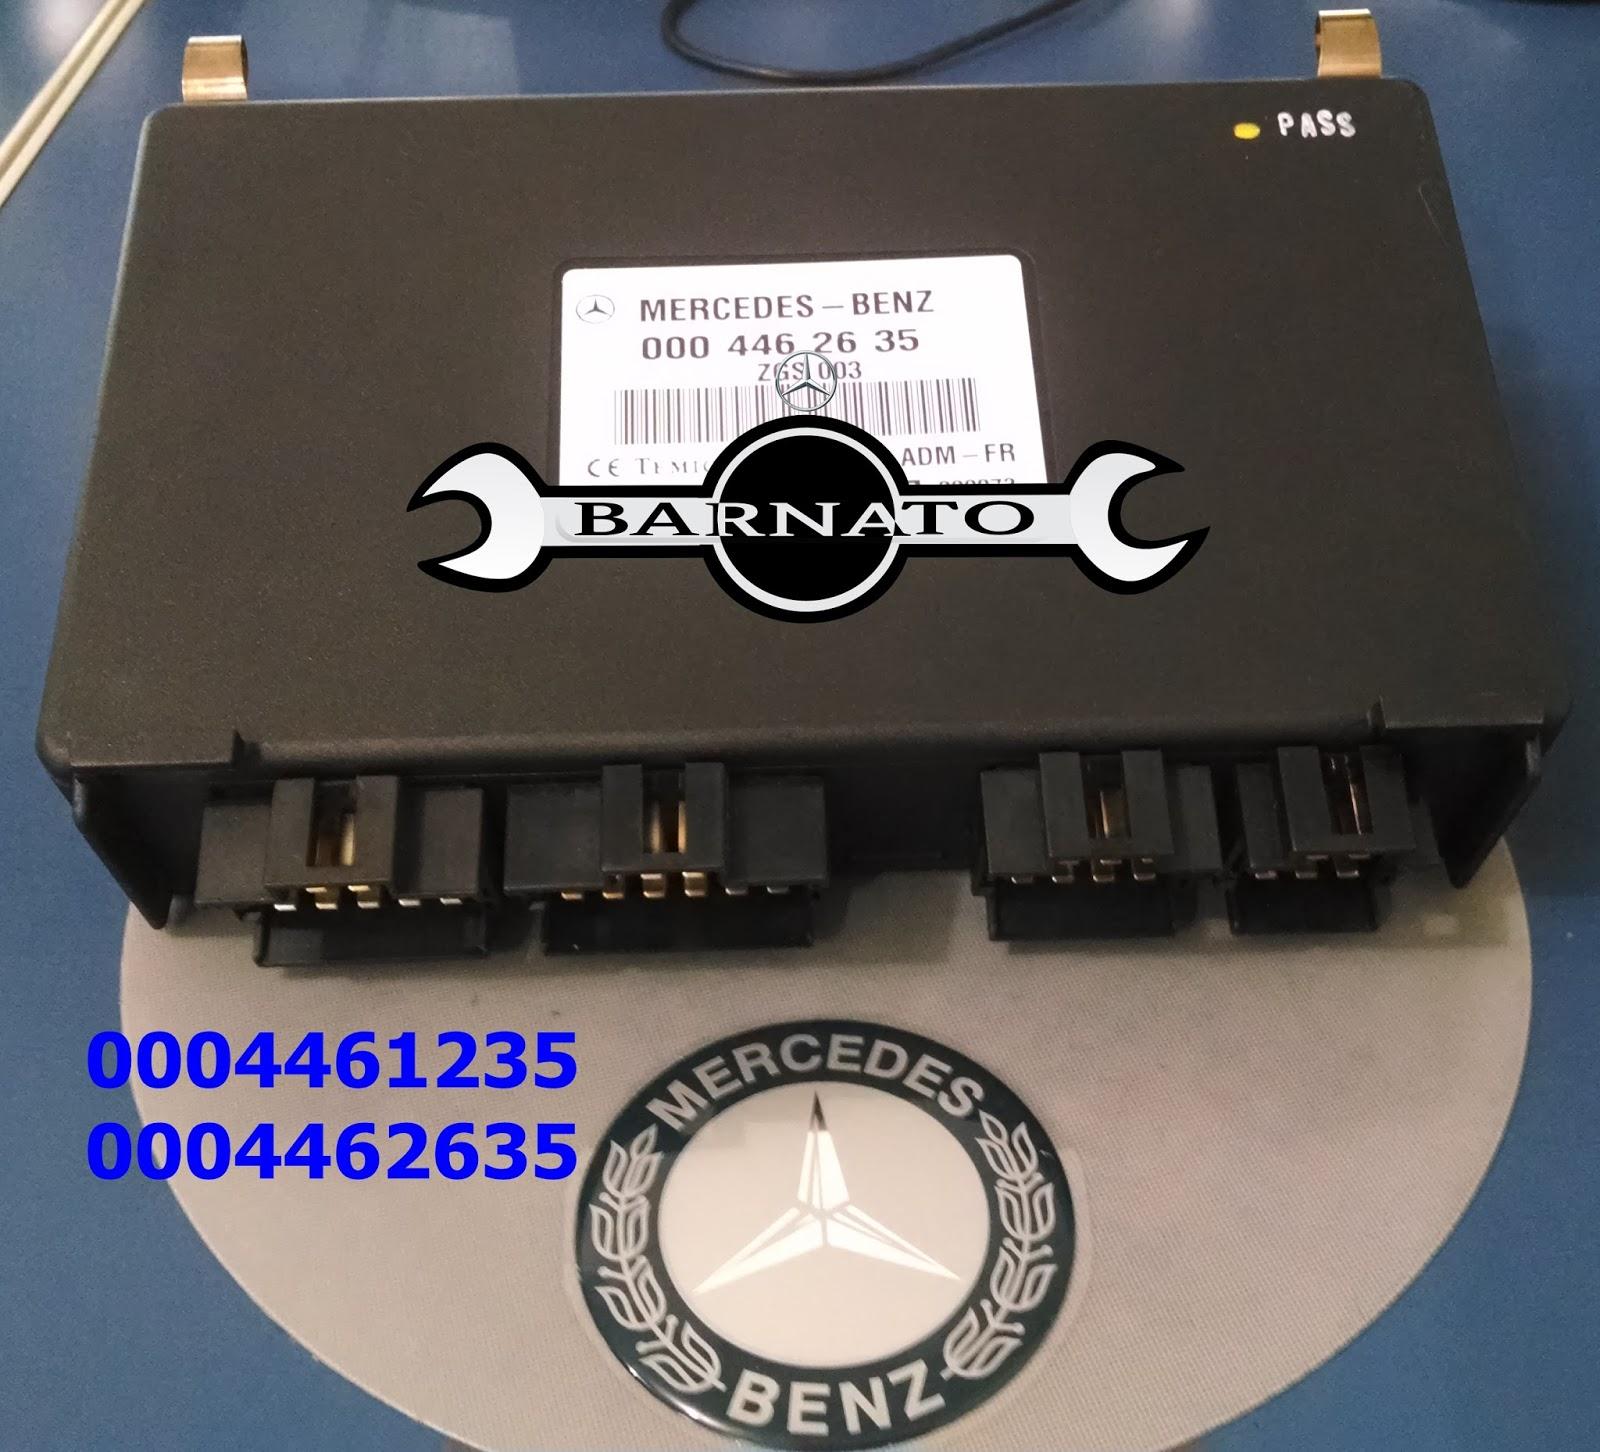 http://www.barnatoloja.com.br/produto.php?cod_produto=6425694